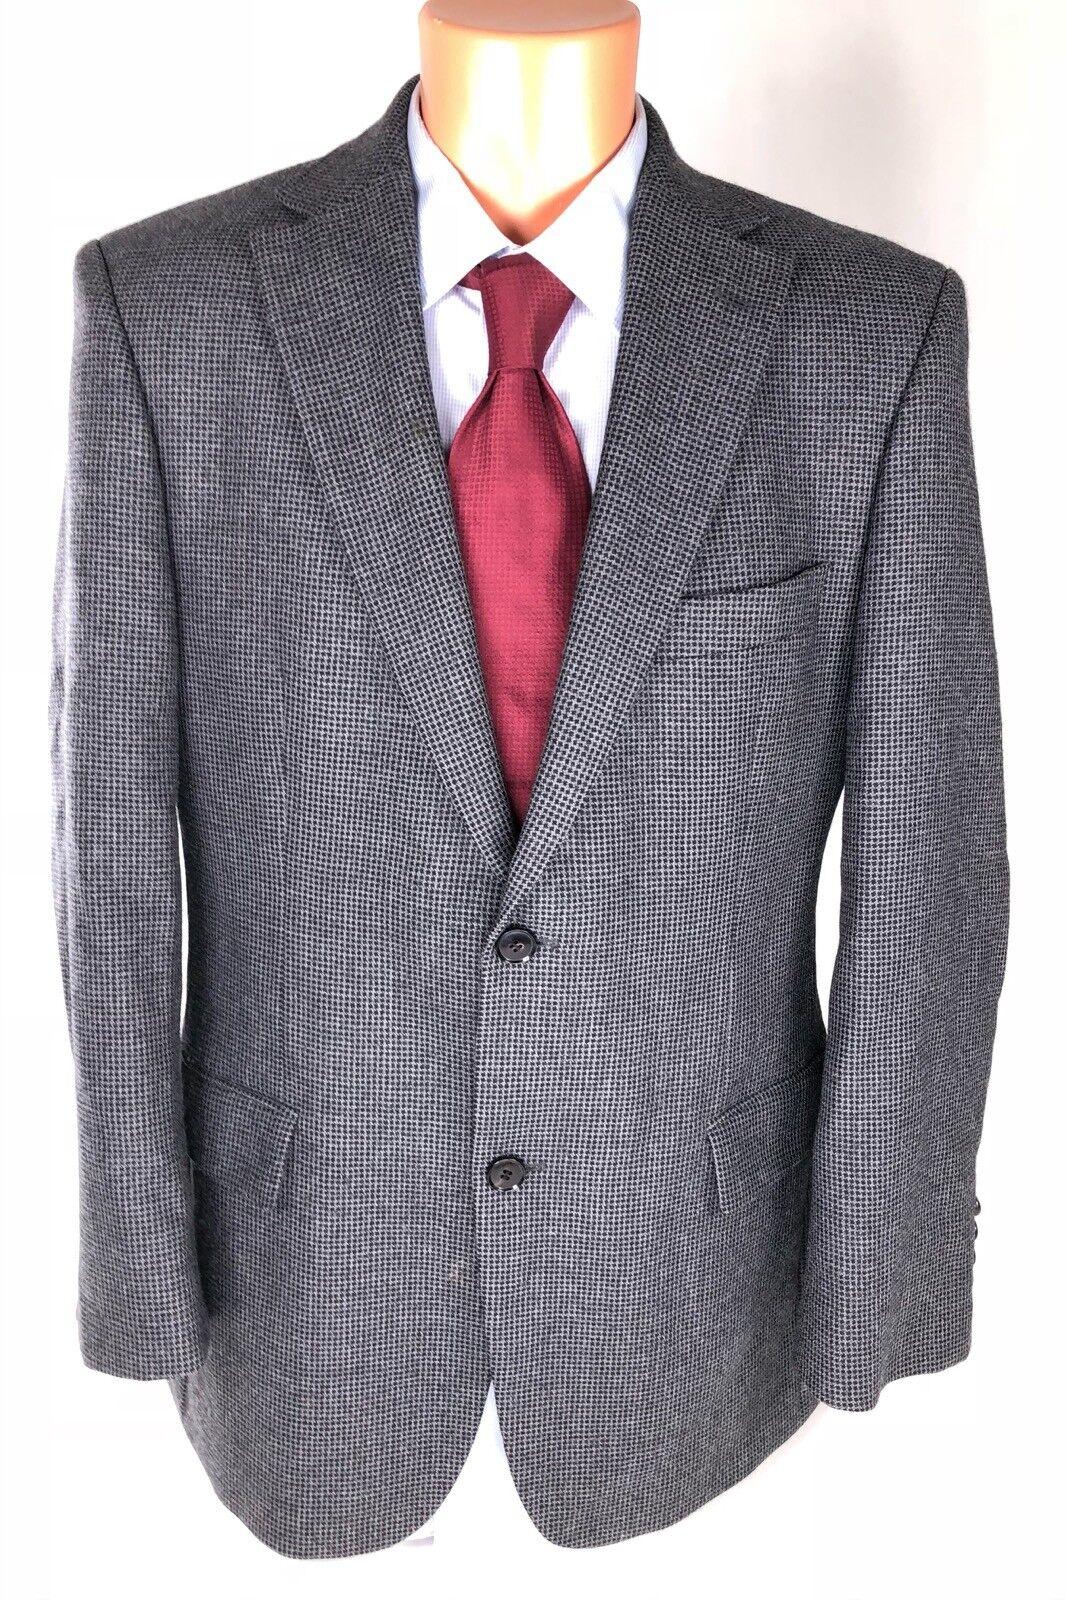 HUGO BOSS  Herren Sport Coat Blauish grau Dual Vented Wool Blazer Größe 40 R